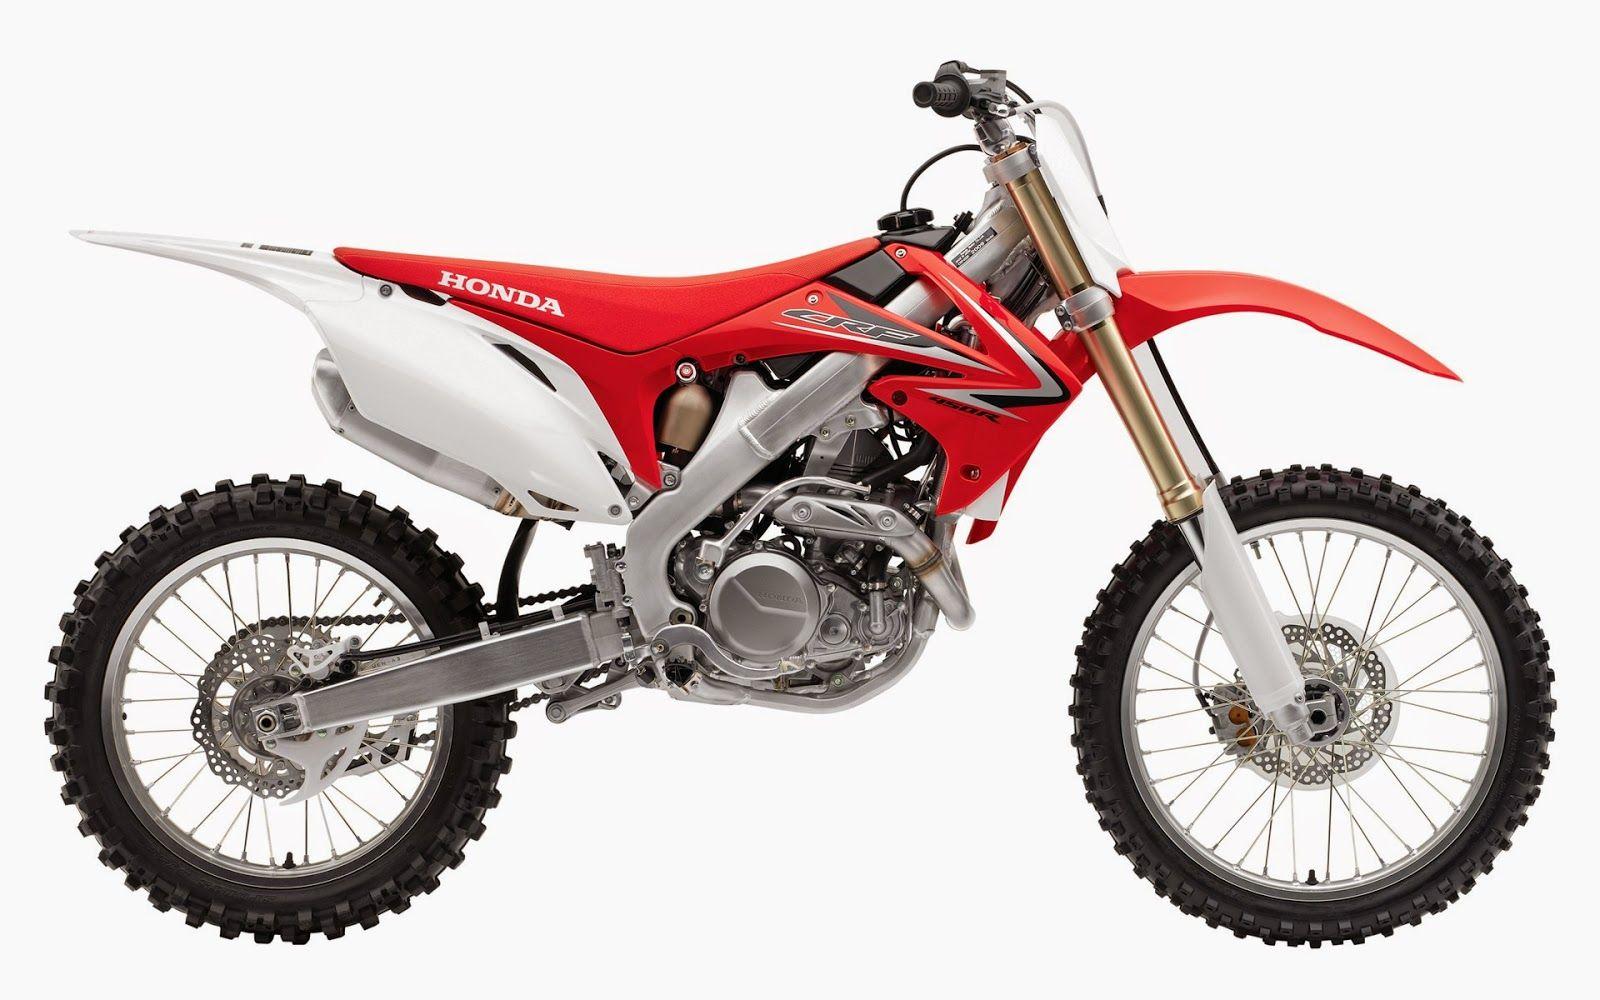 Picture Of Honda Crf 450r Motocross Honda Powersports Dirtbikes Motorcycle